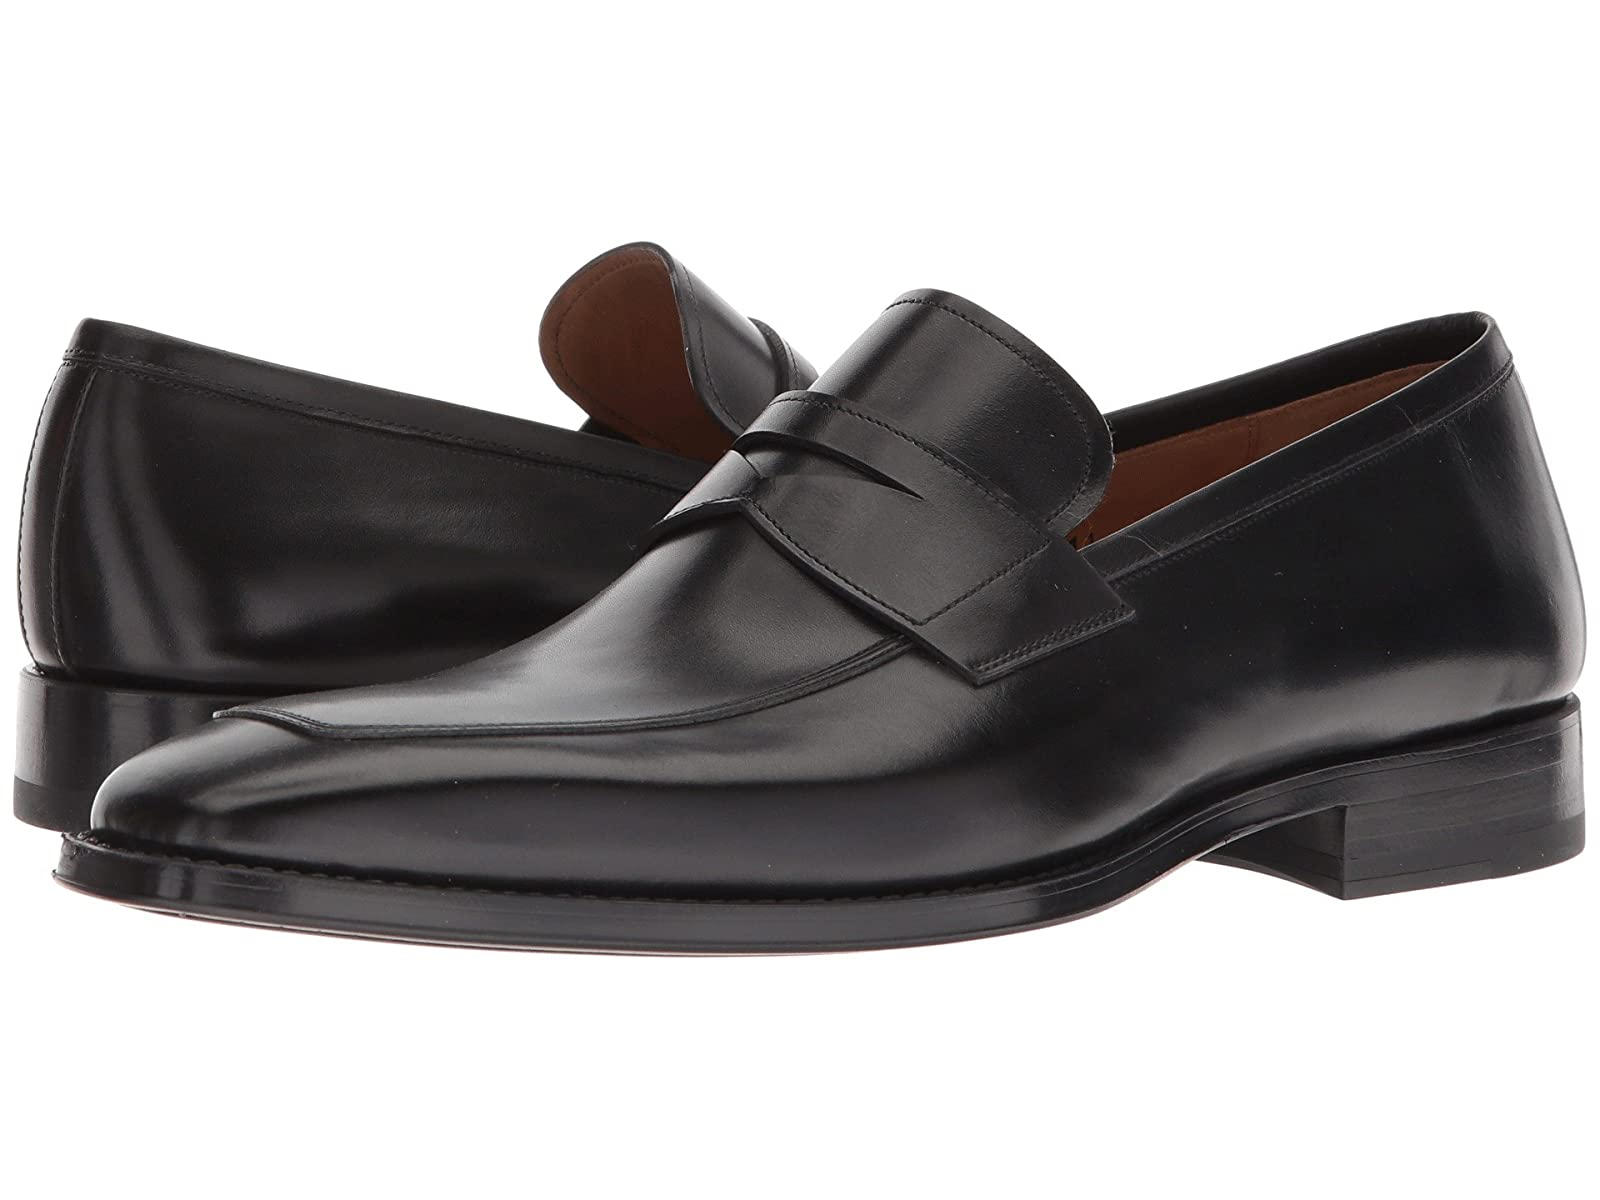 Magnanni MarcAtmospheric grades have affordable shoes